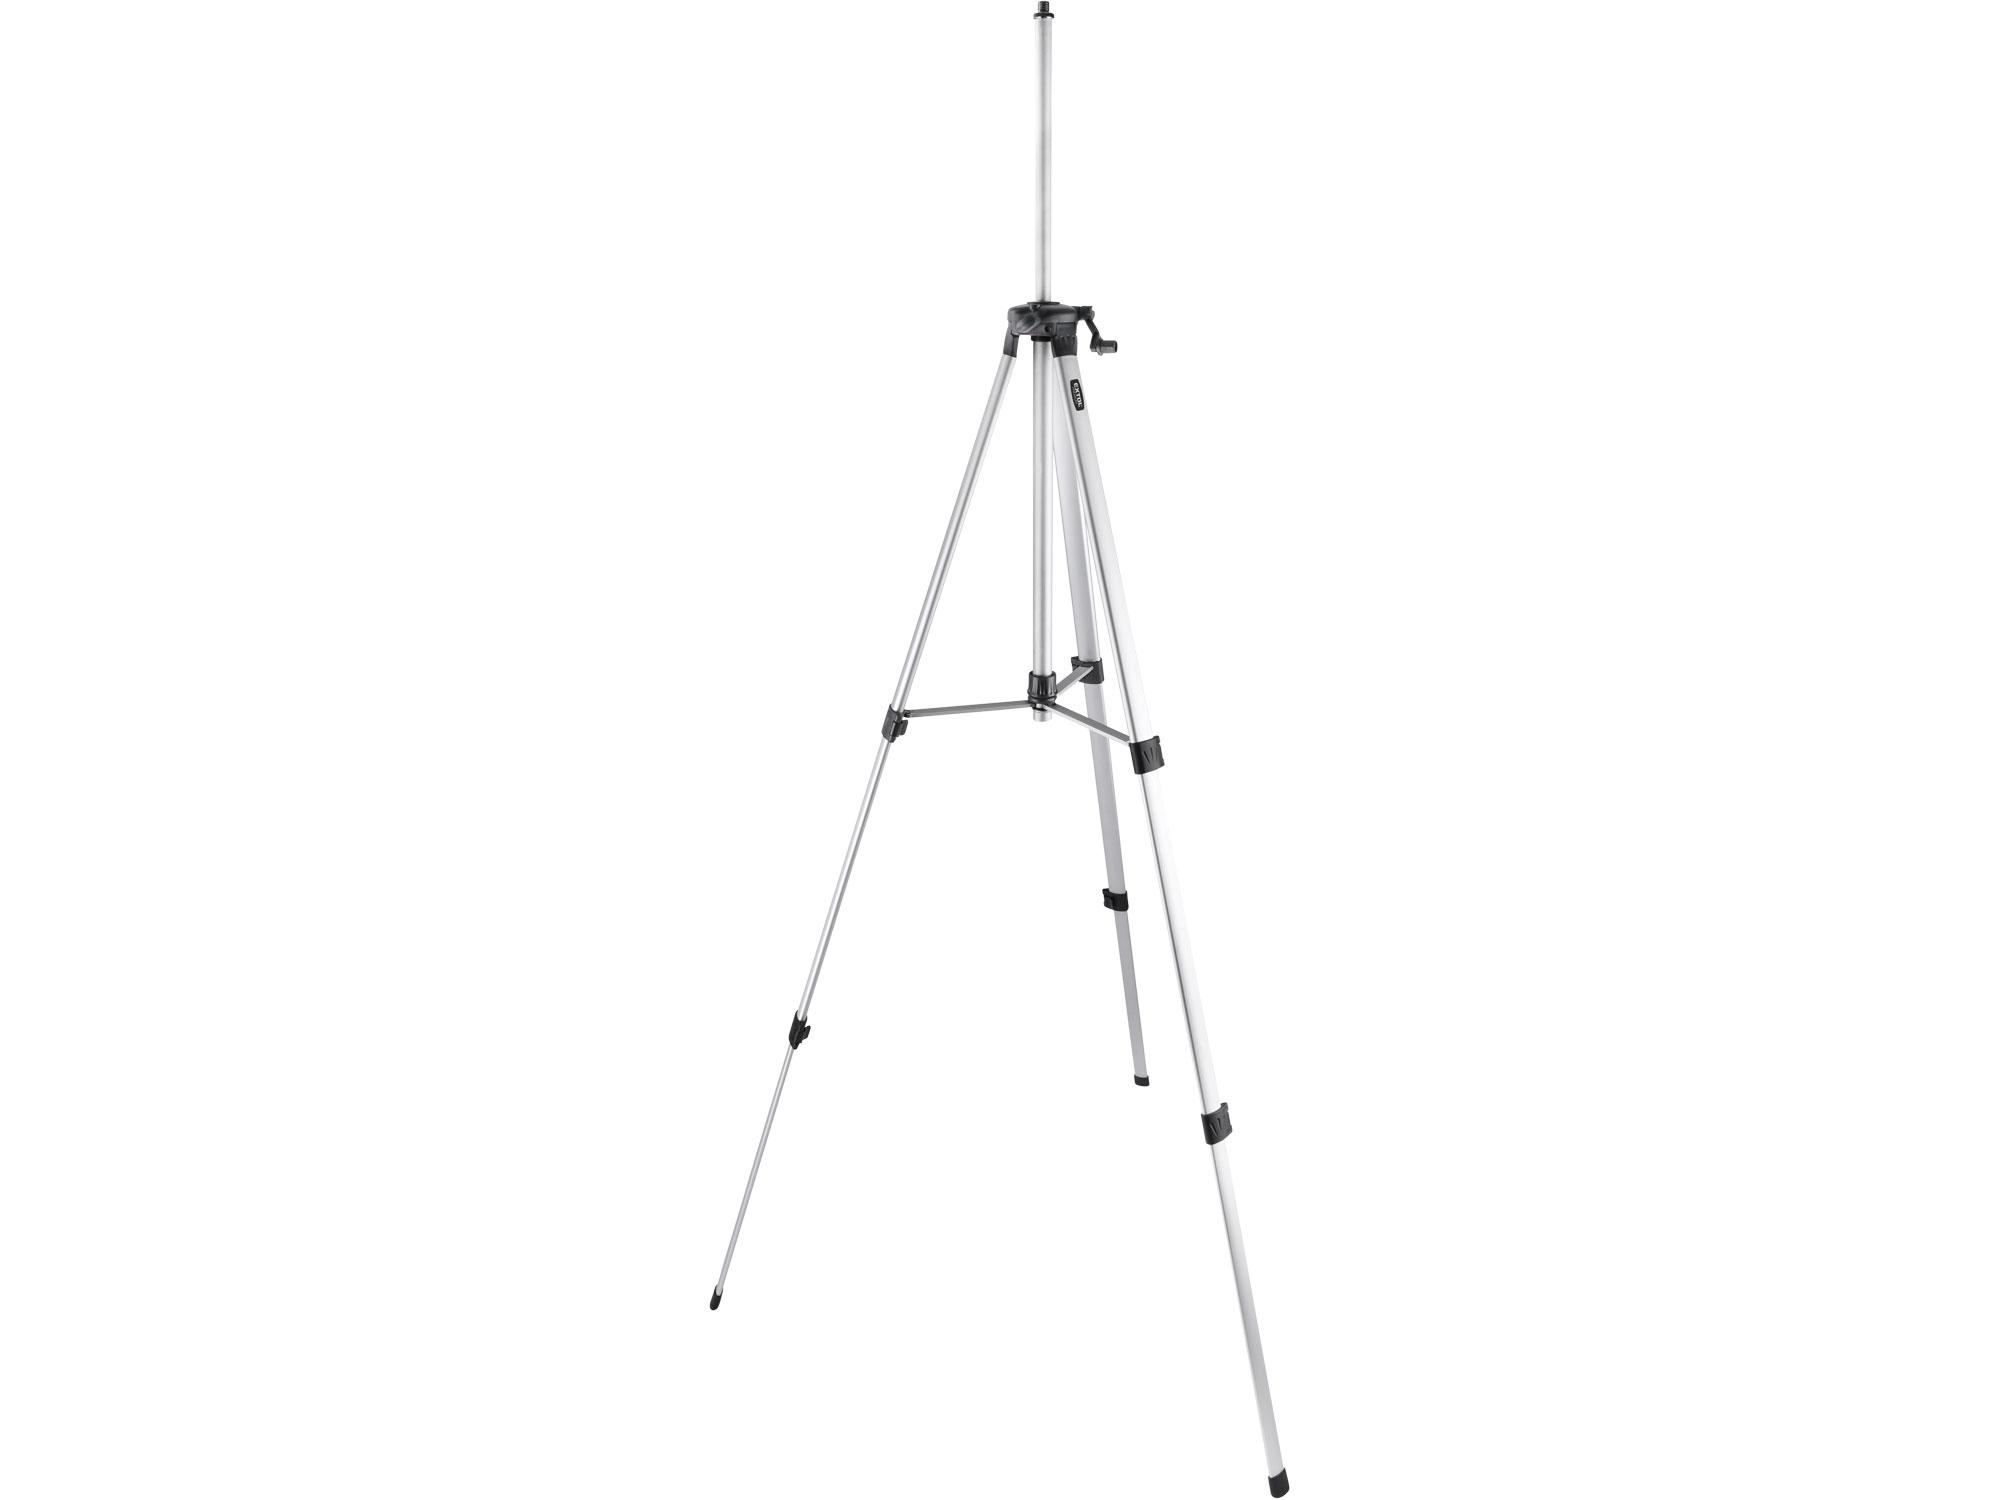 stativ výsuvný, 650-1800mm, EXTOL PREMIUM 8823903